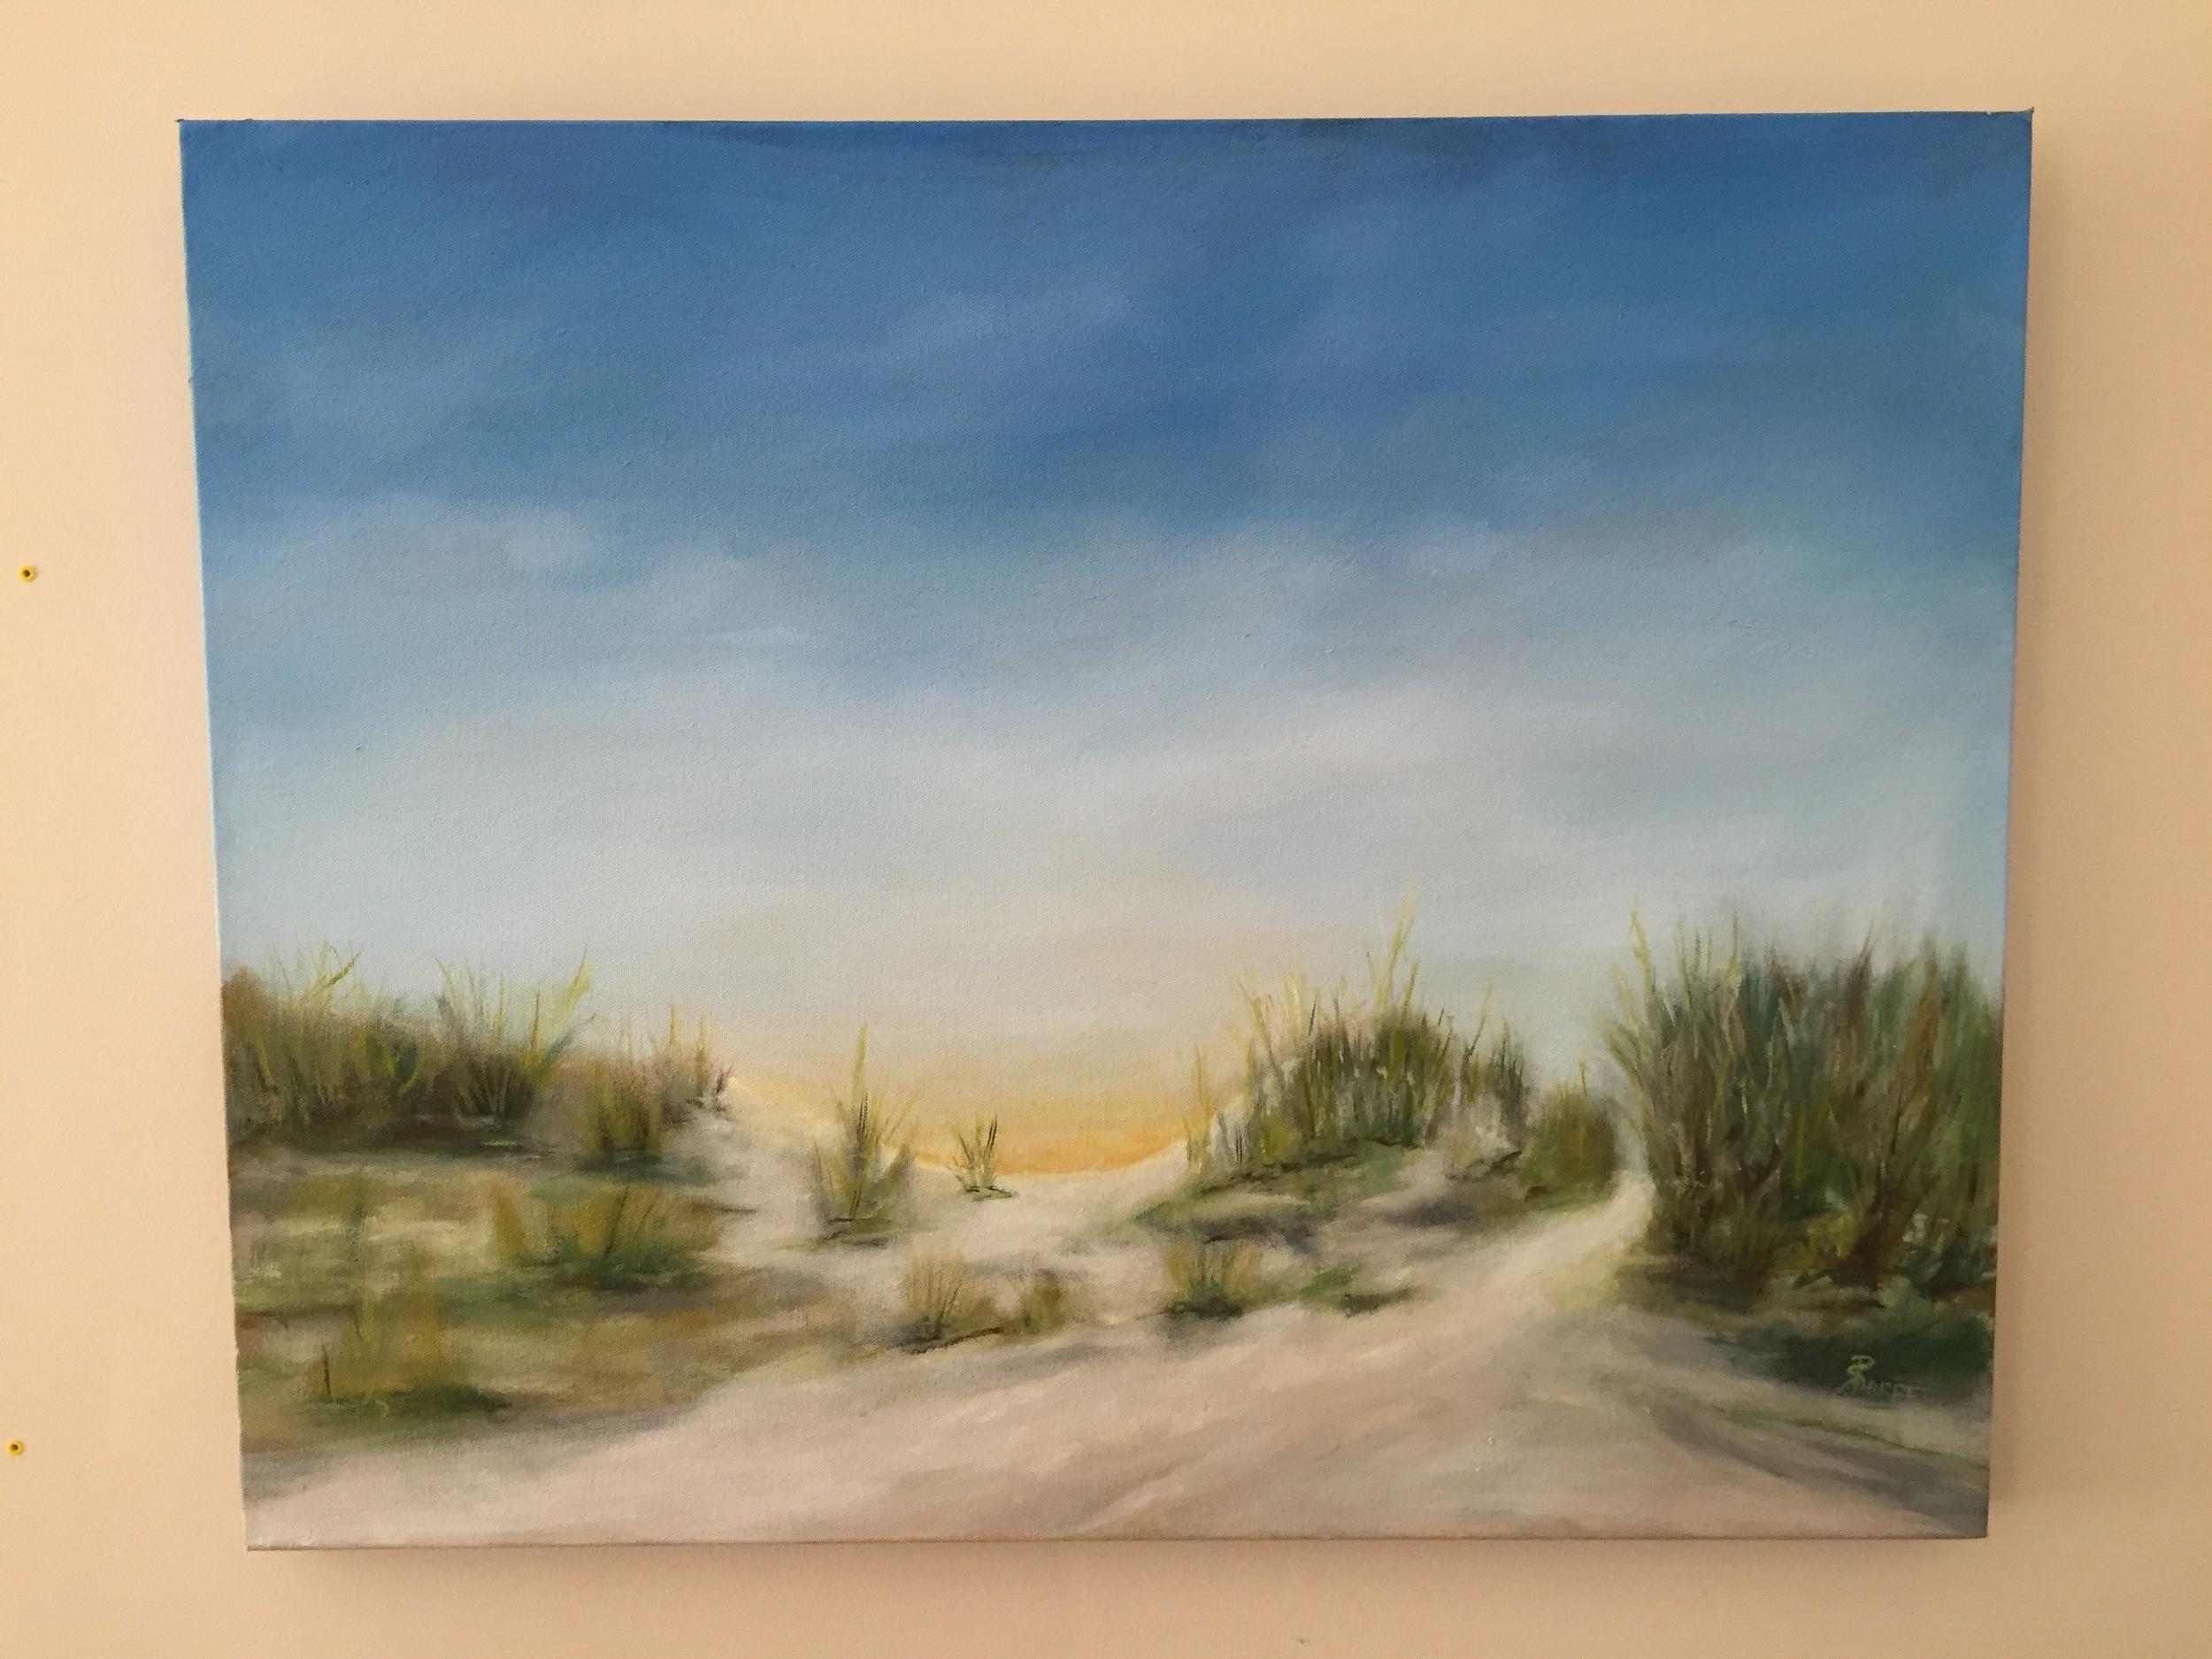 landscape-oil-painting-sunrise-grasses-sand-phyllis-sharpe-IMG_2174.jpg